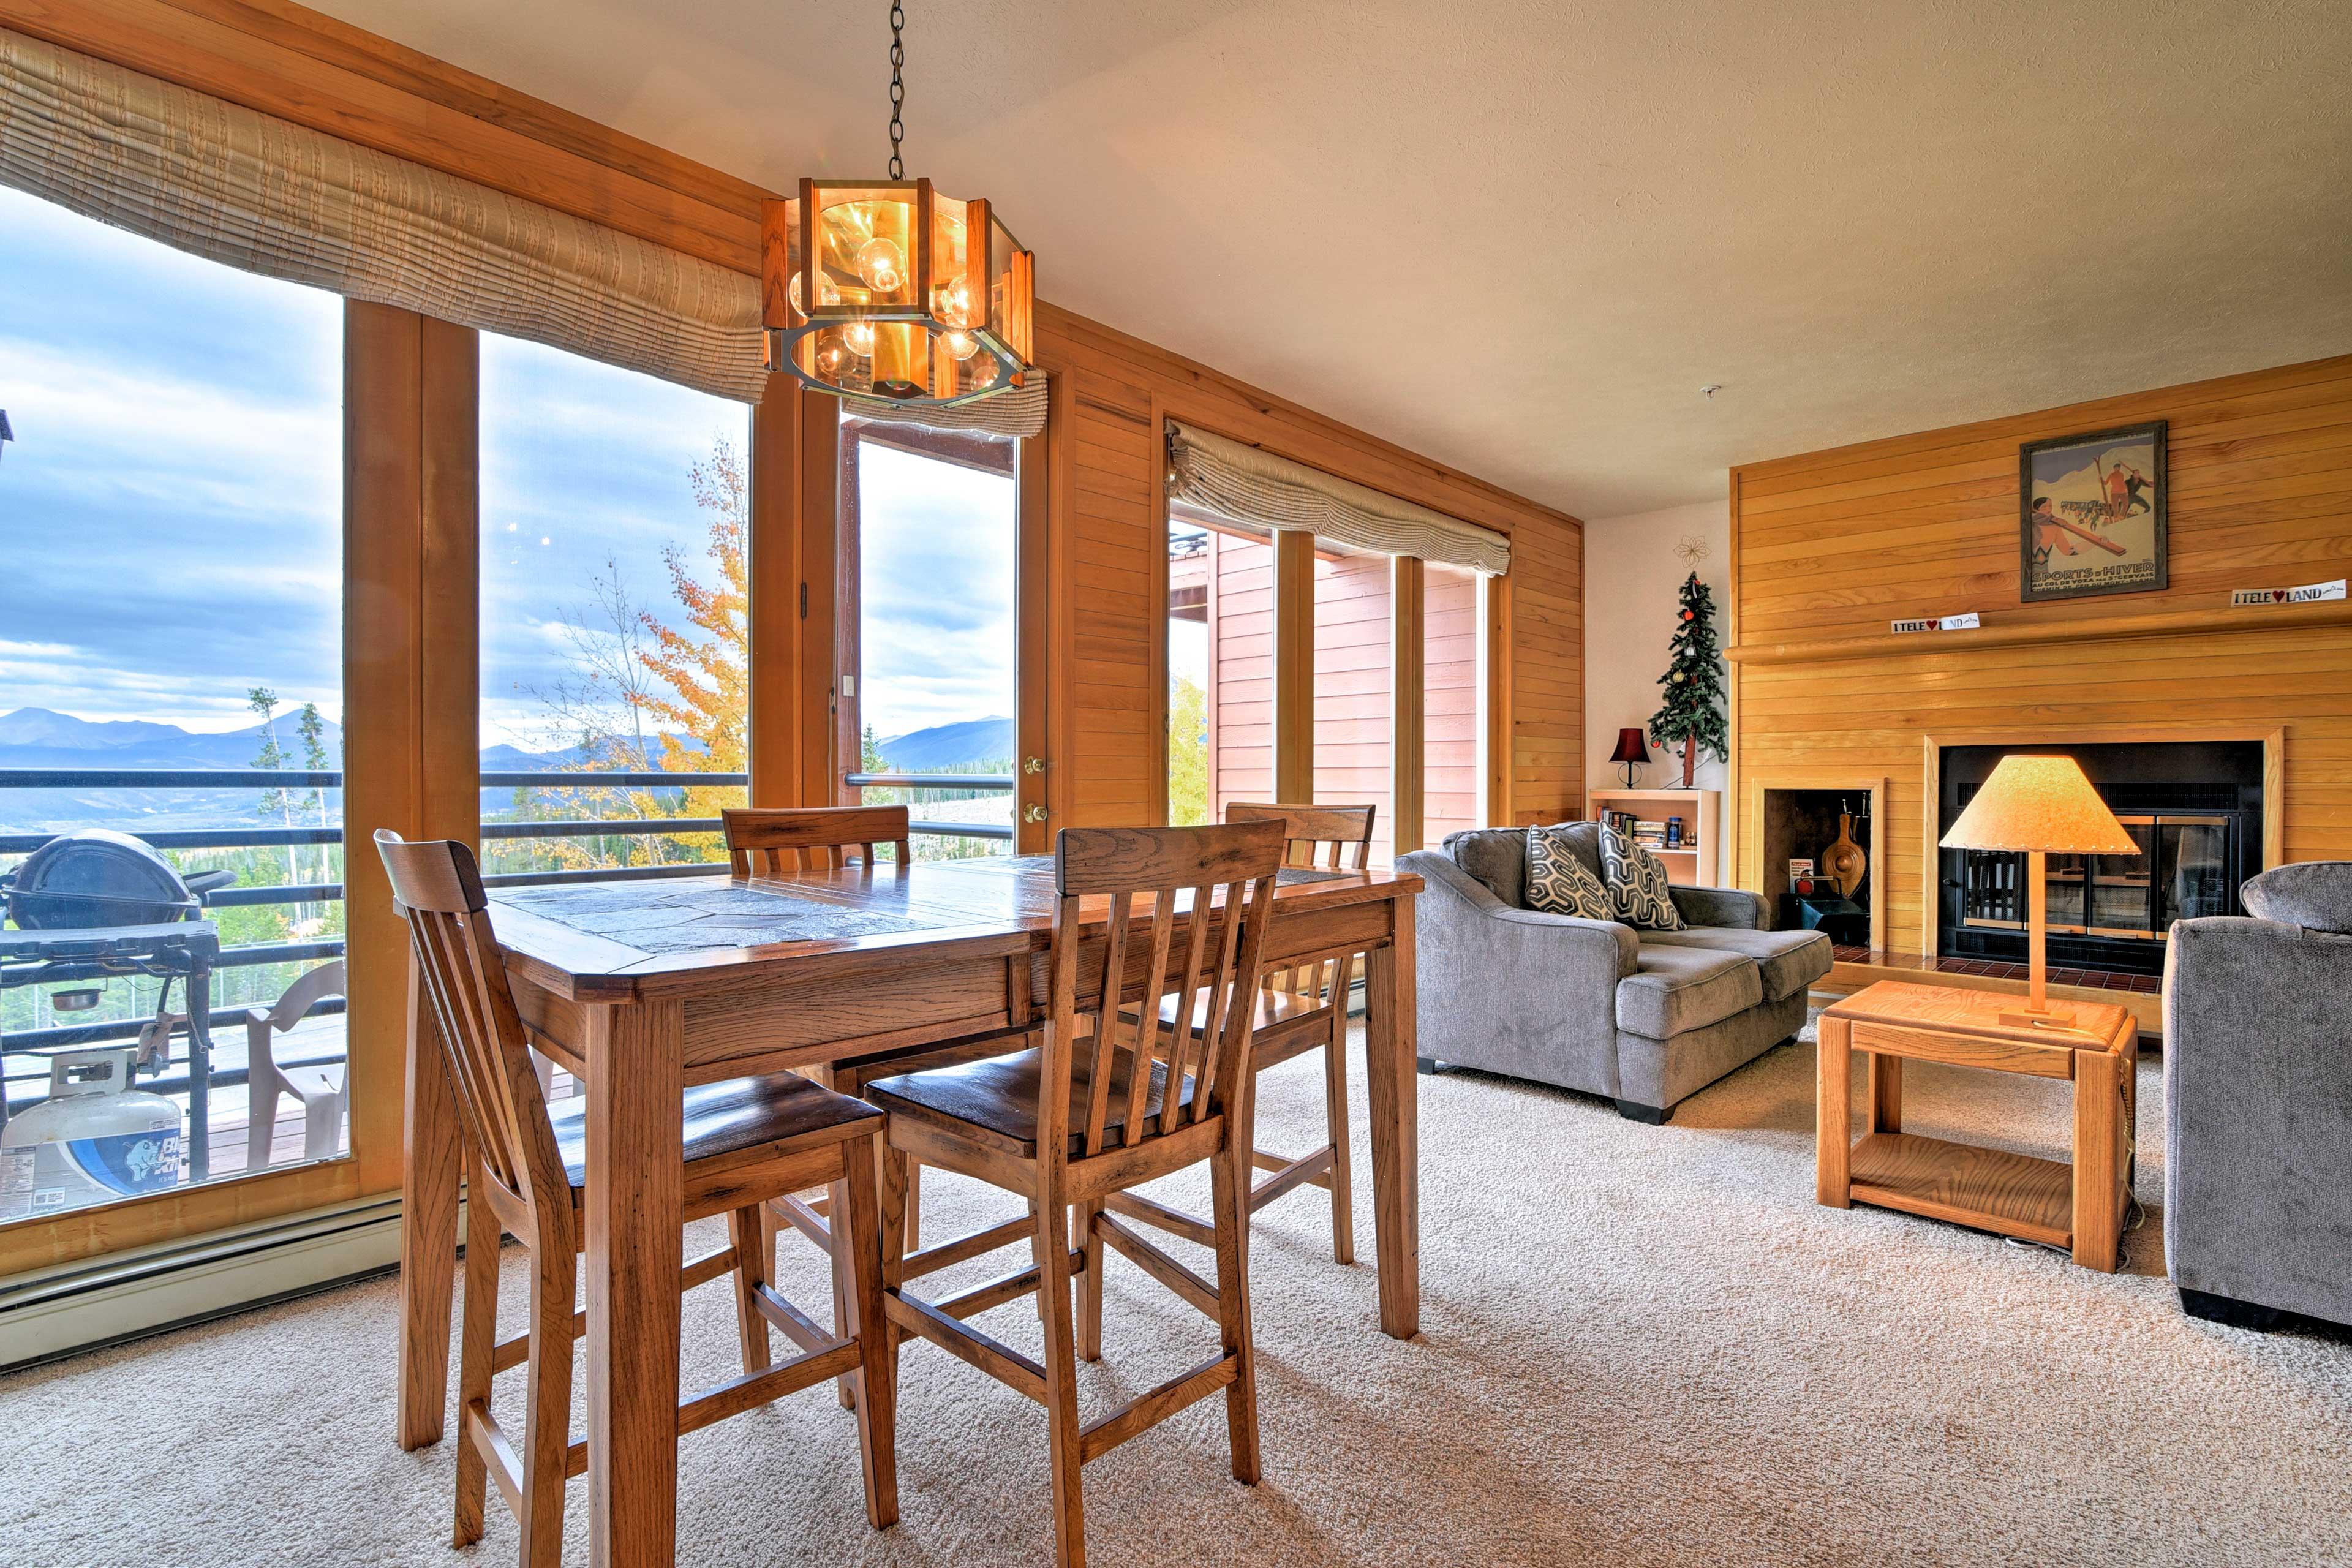 Unwind in this 2-bedroom, 2-bathroom vacation rental condo in Silverthorne.